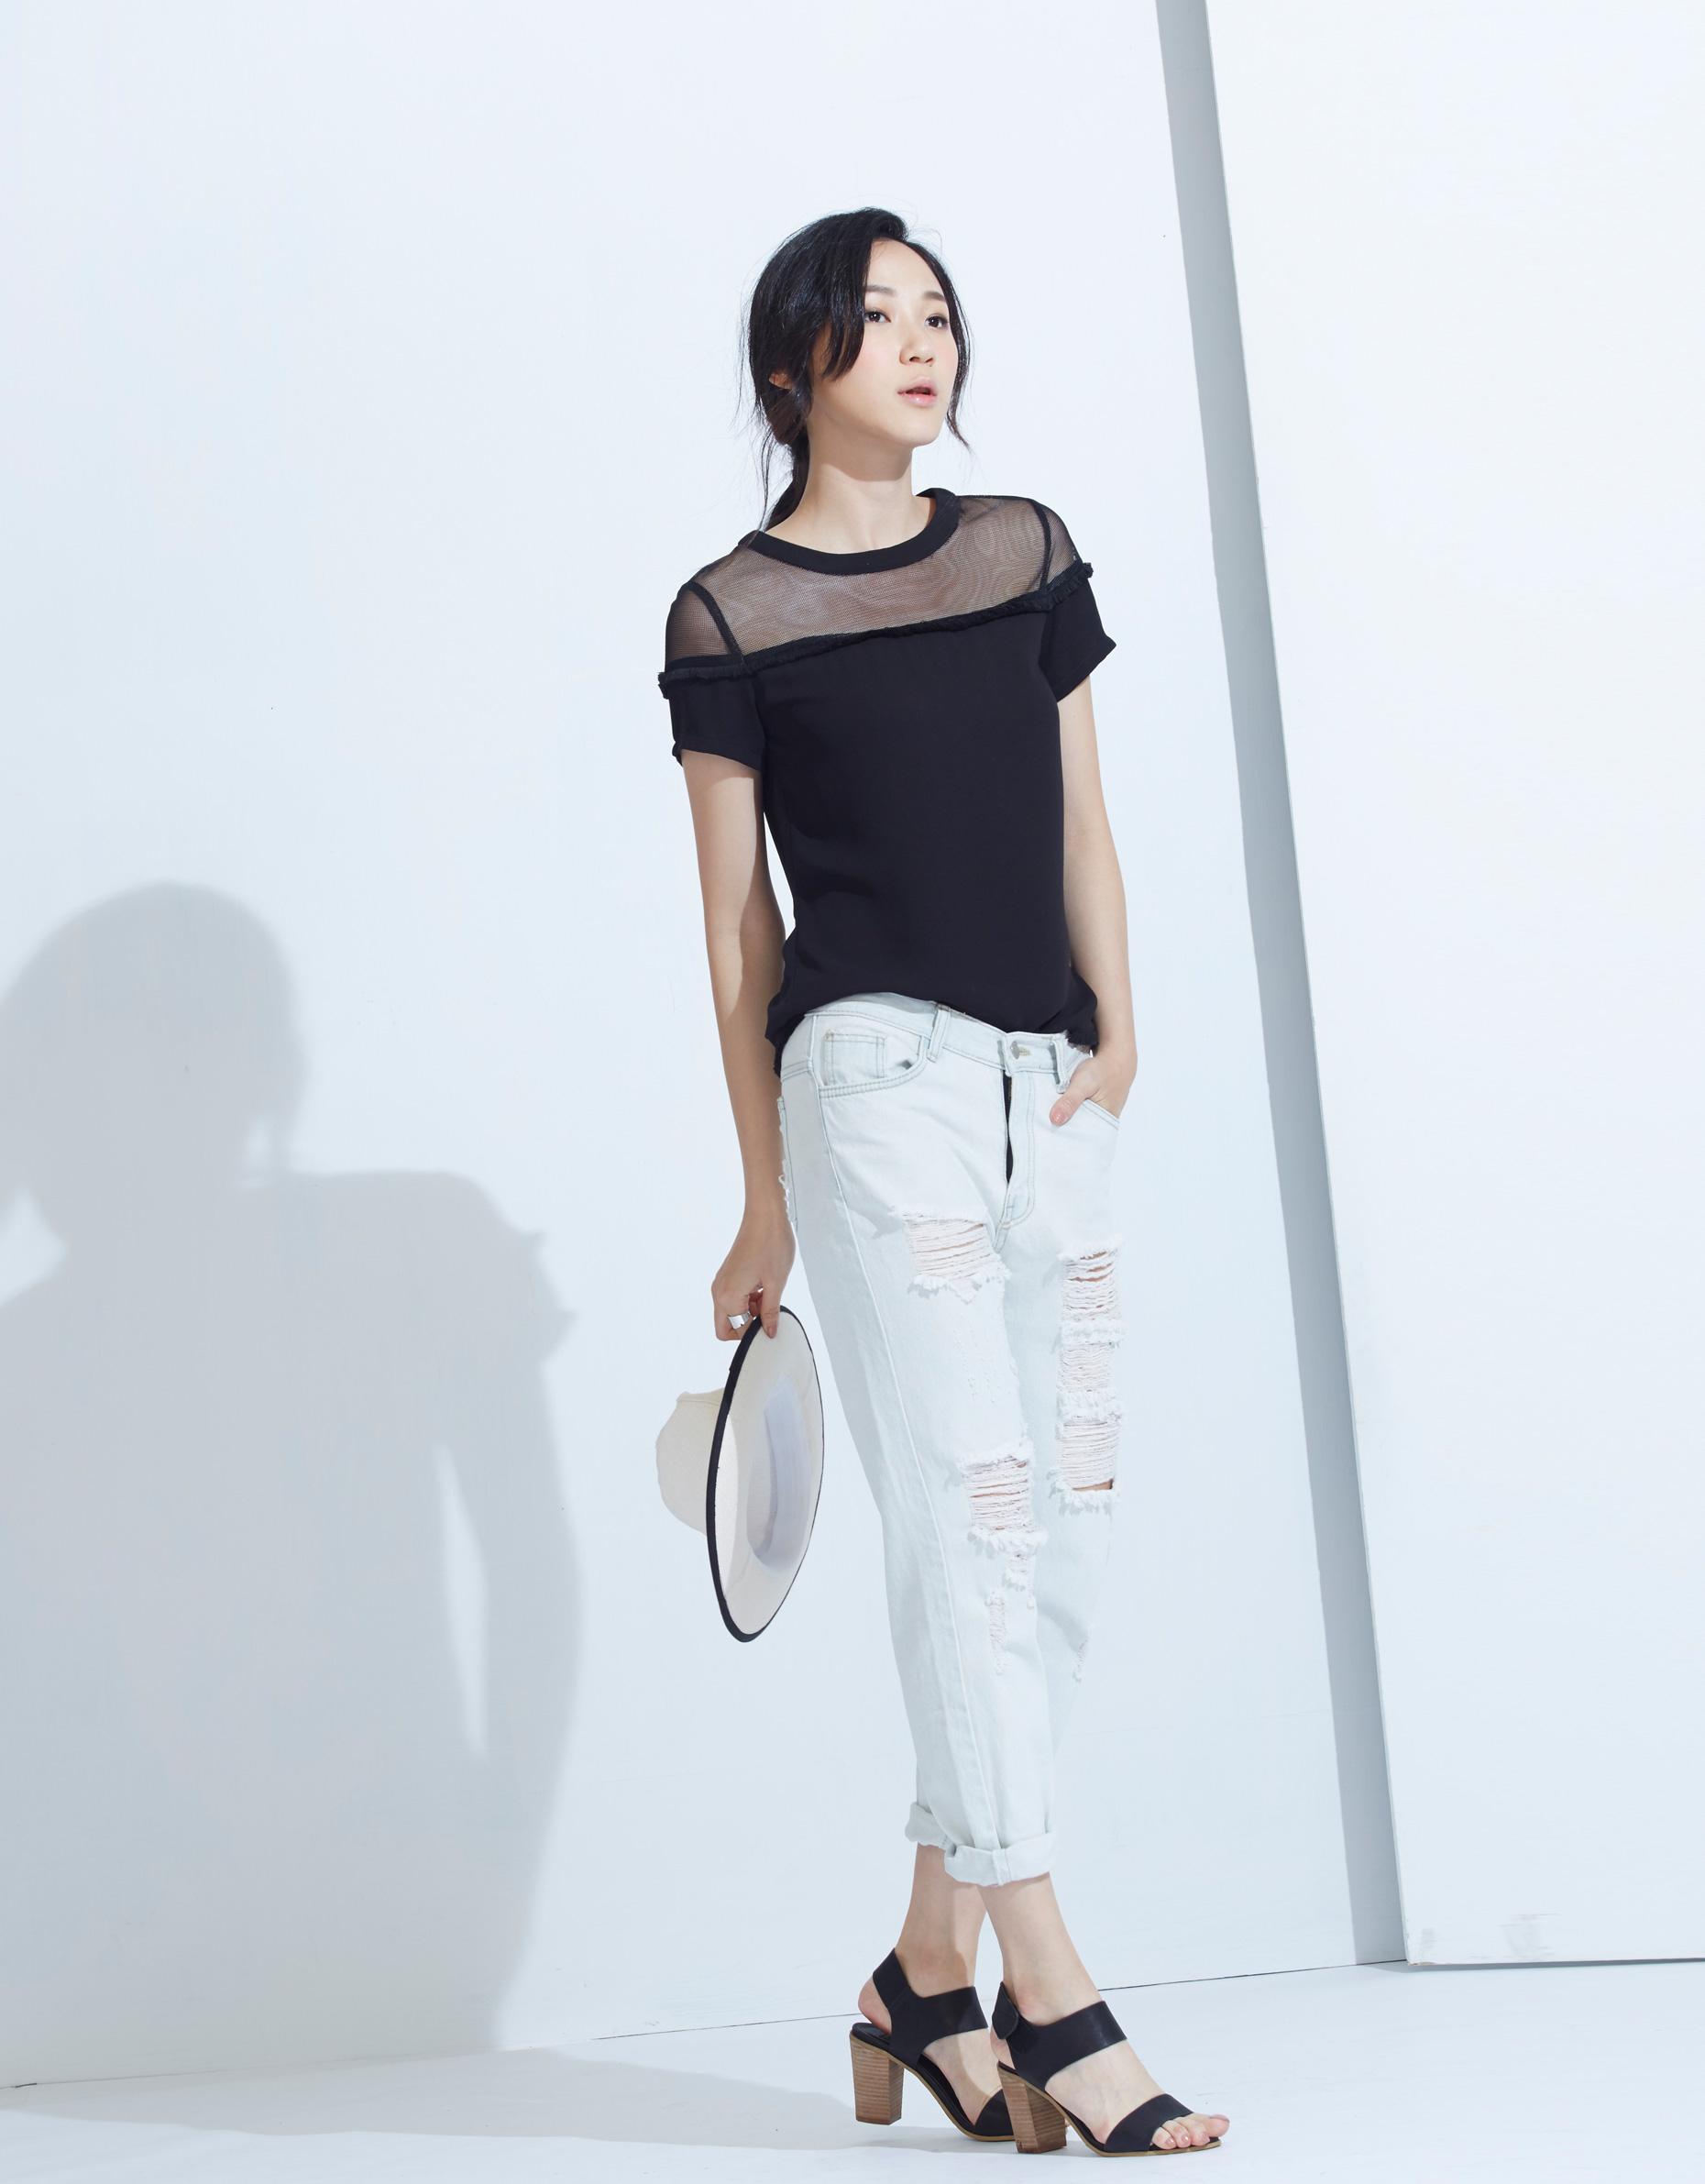 KODZ Womens Top with Sheer Yoke Japanese/Korean Fashion   eBay